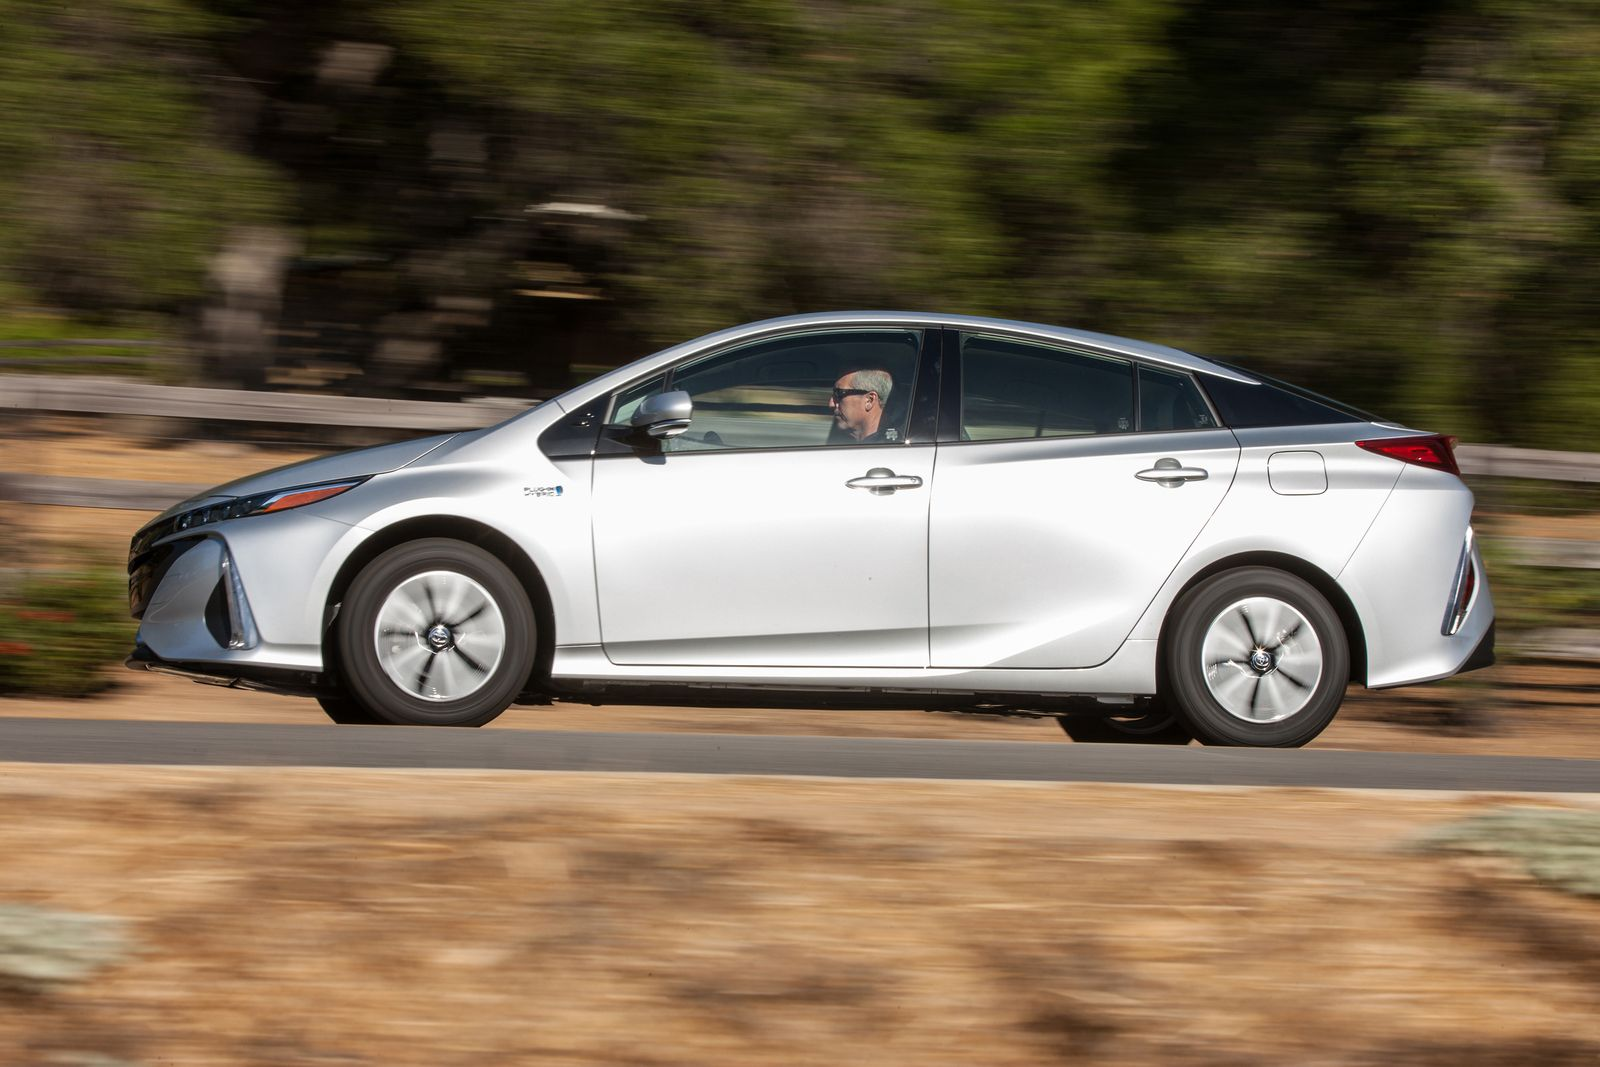 2017 / Toyota Prius Plug-in-Hybrid